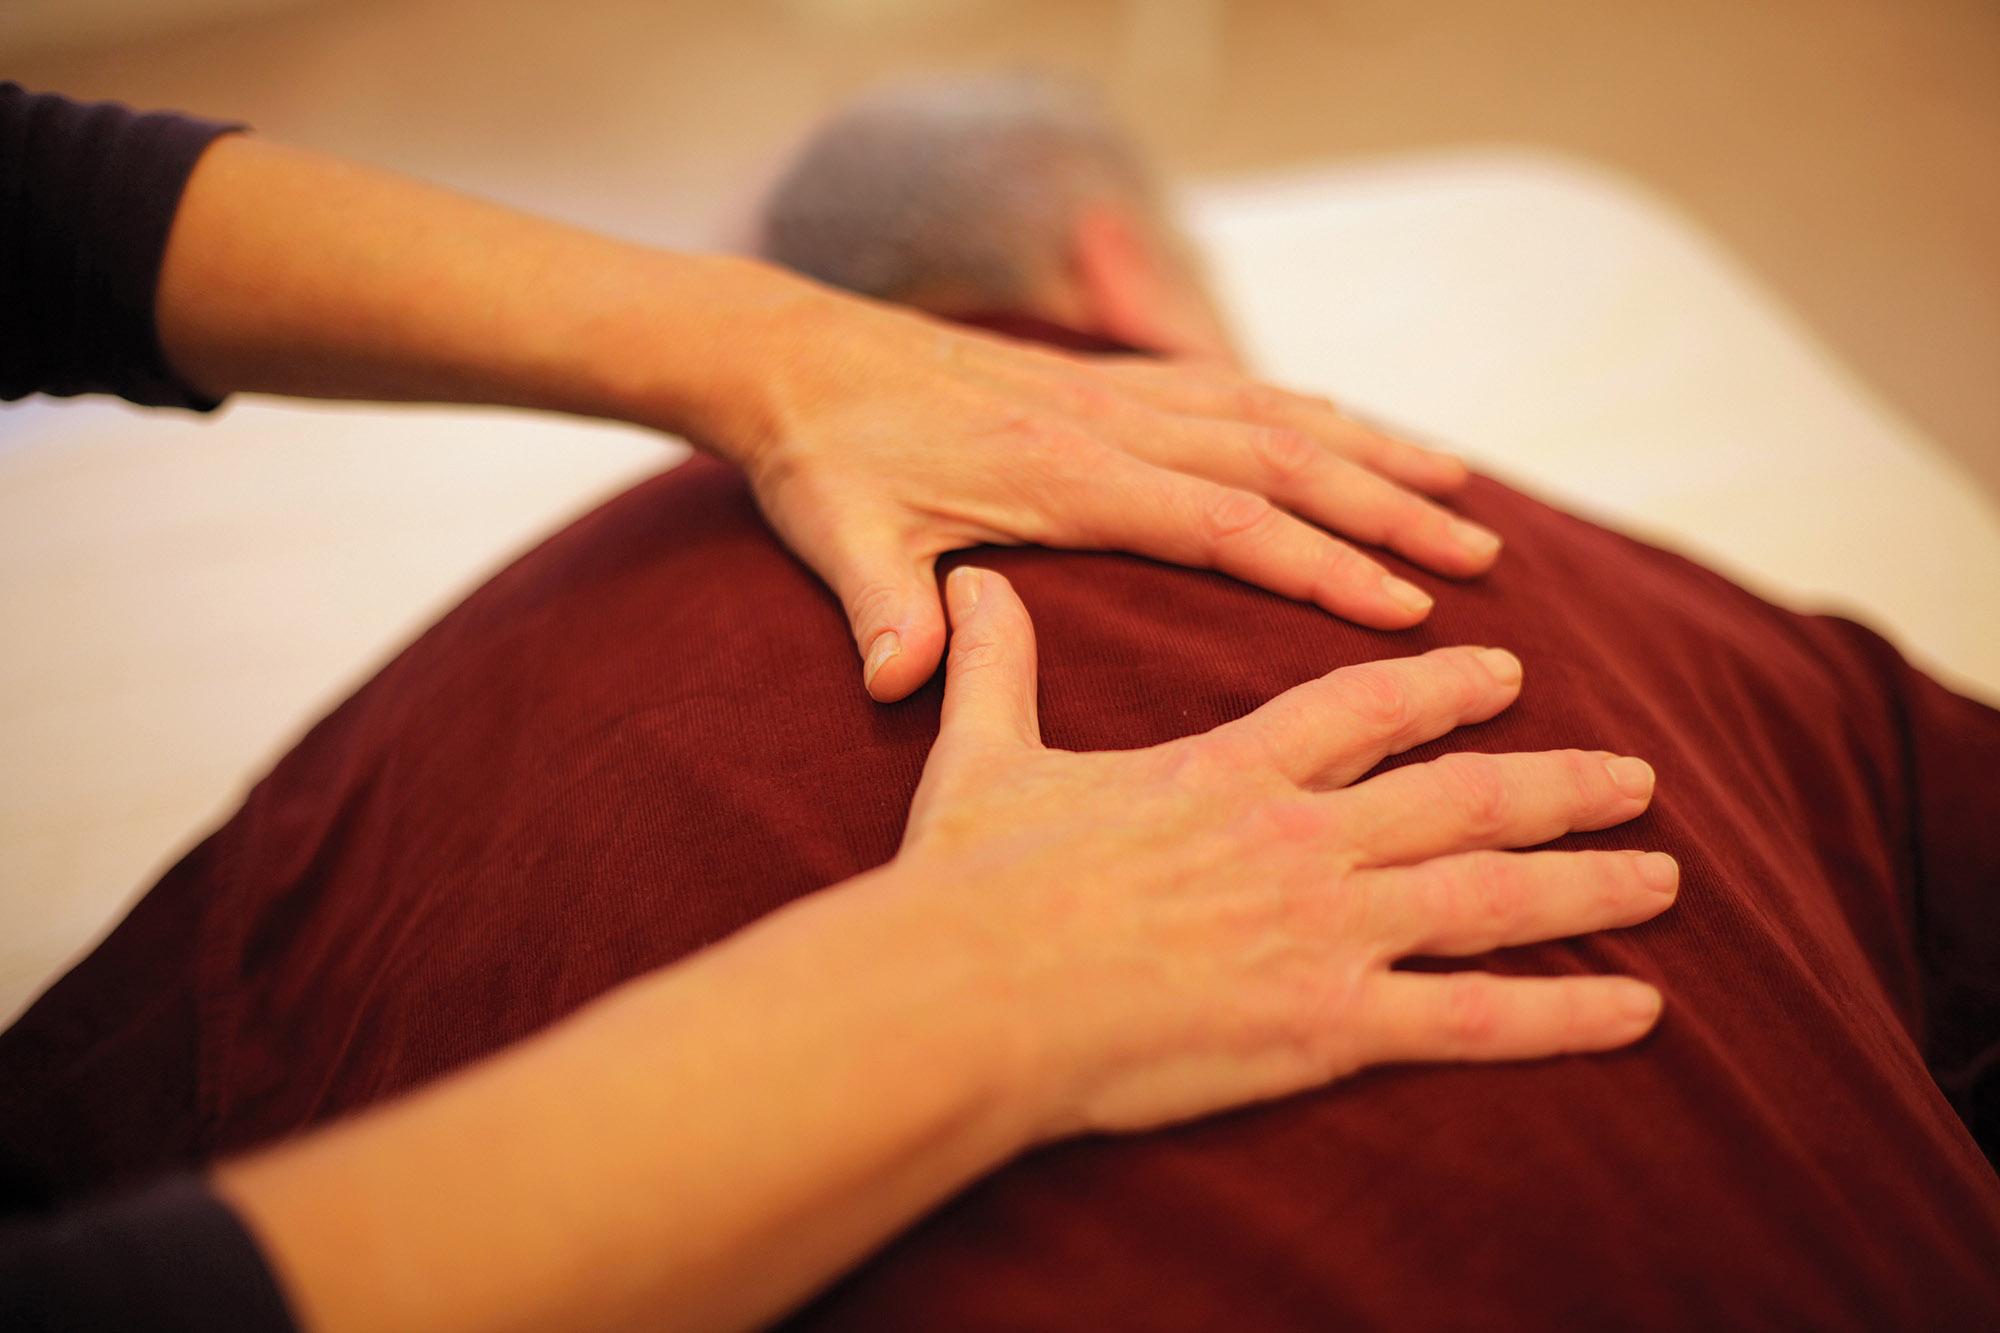 Atem und Körpertherapie